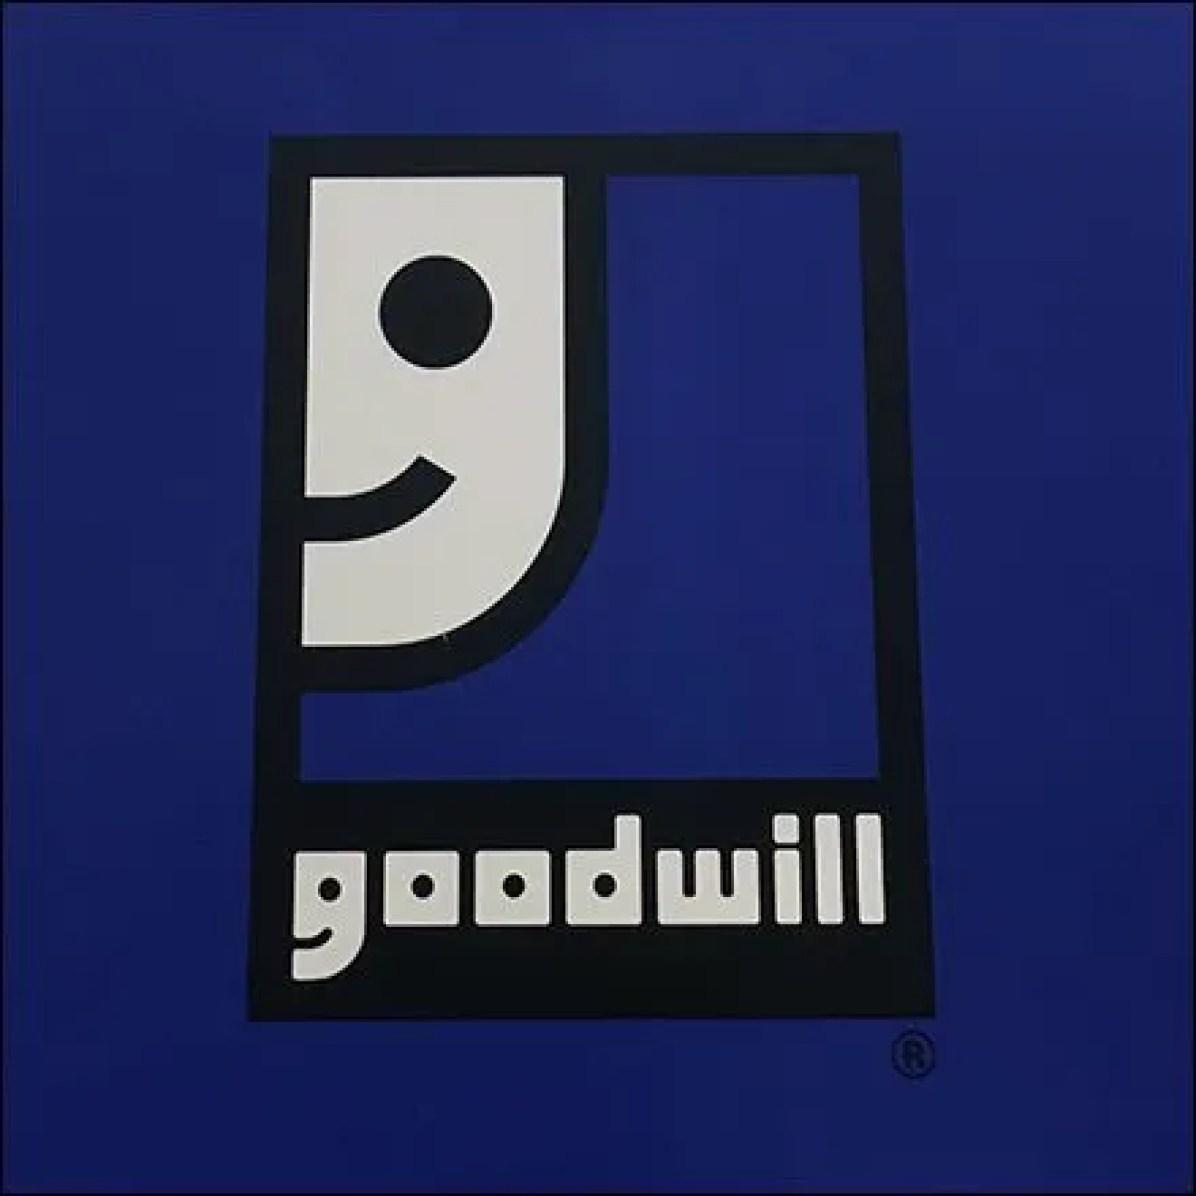 bon-ton-goodwill-sale-logo